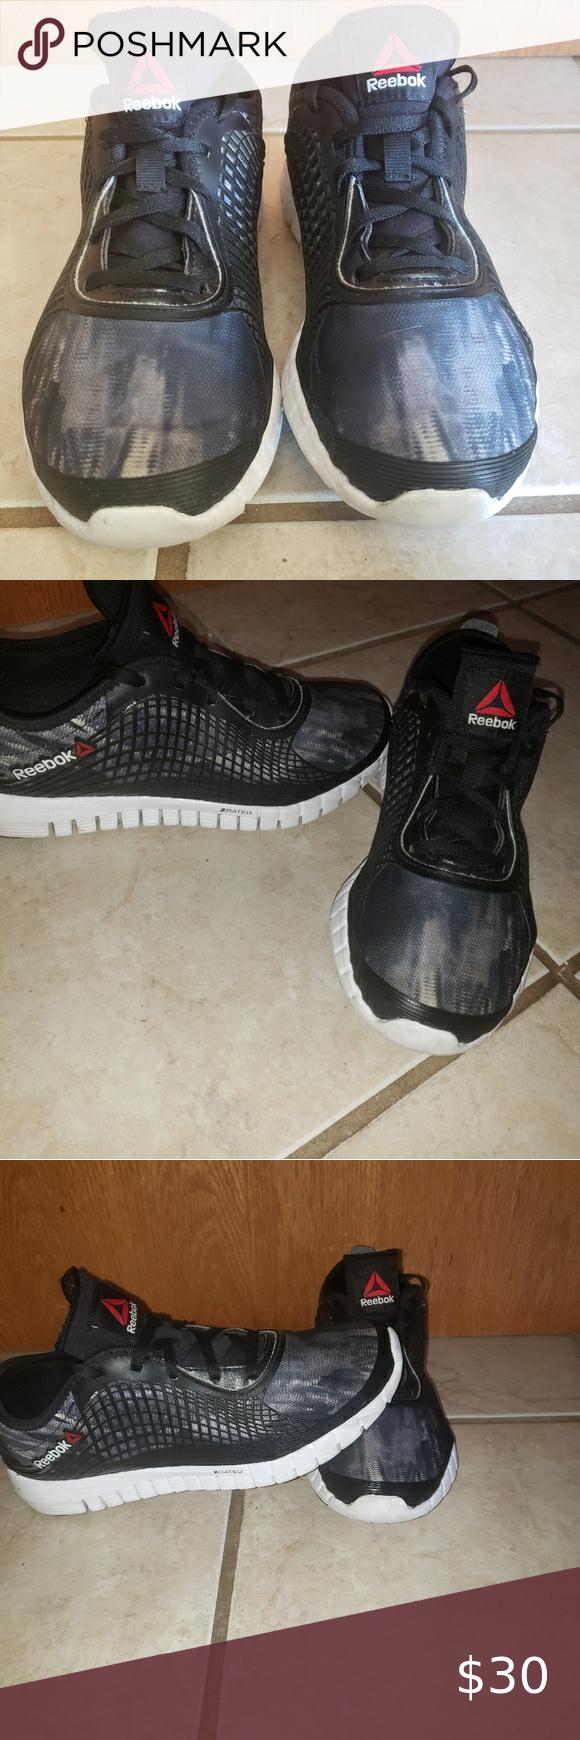 Reebok Z Rated Running Shoe Running Light Weight Shoe Internal Stretch Bio Sleeve External Nanoweb Support System Anatomical Last Running Shoes Reebok Shoes